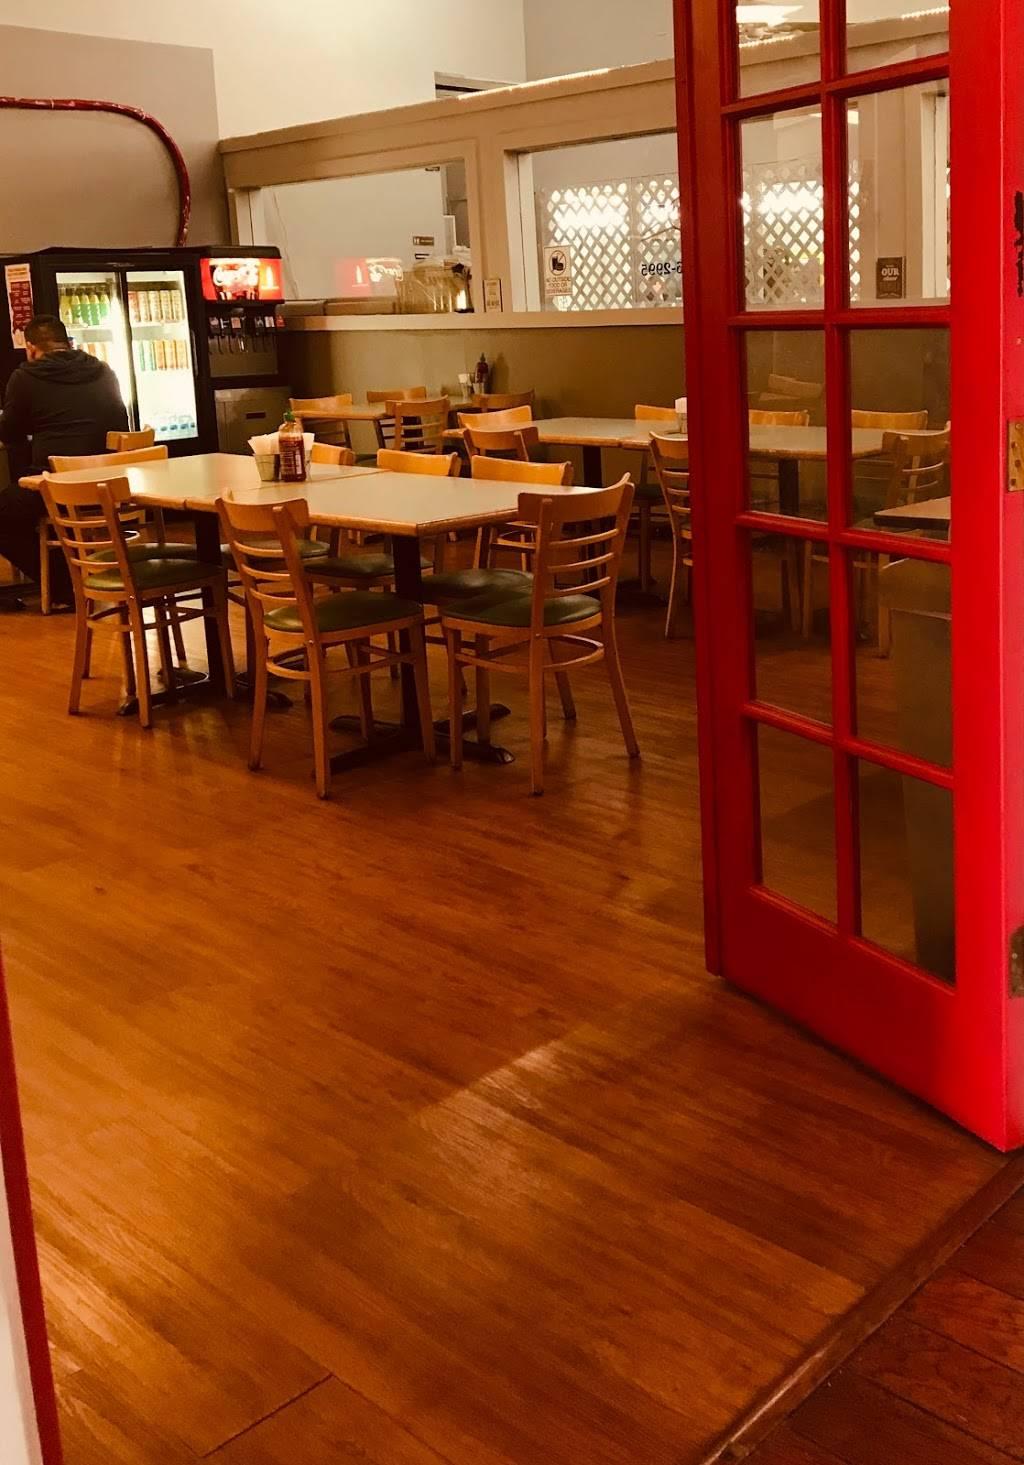 SUSHI-TO - restaurant    Photo 4 of 20   Address: 4224 W Indian School Rd, Phoenix, AZ 85019, USA   Phone: (602) 396-2995